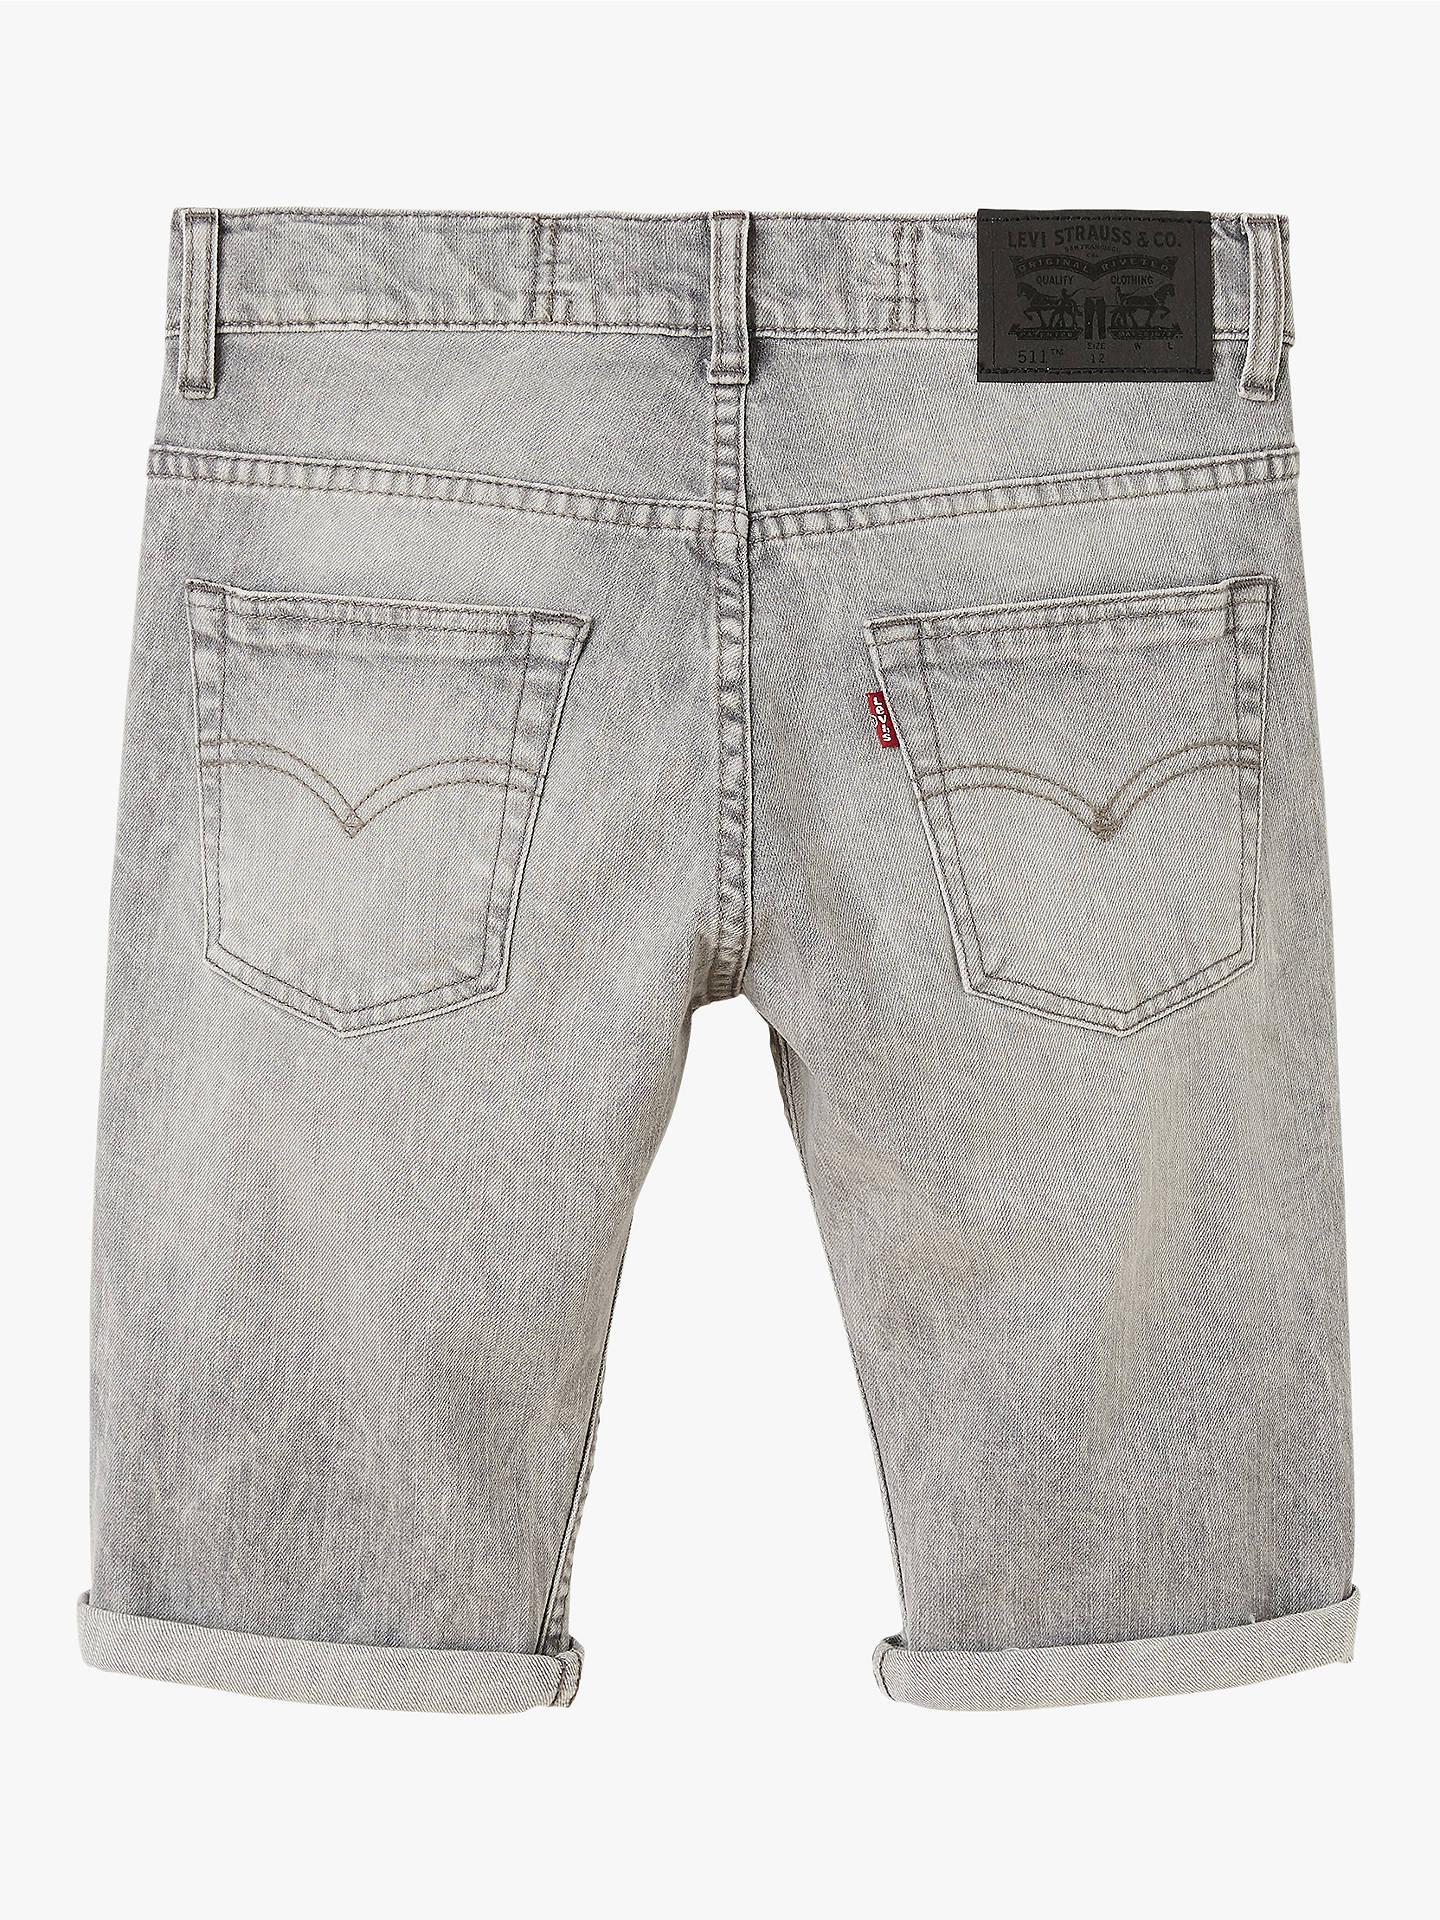 7ff938170c ... Buy Levi's Boys' 511 Denim Bermuda Shorts, Grey, 6 years Online at  johnlewis